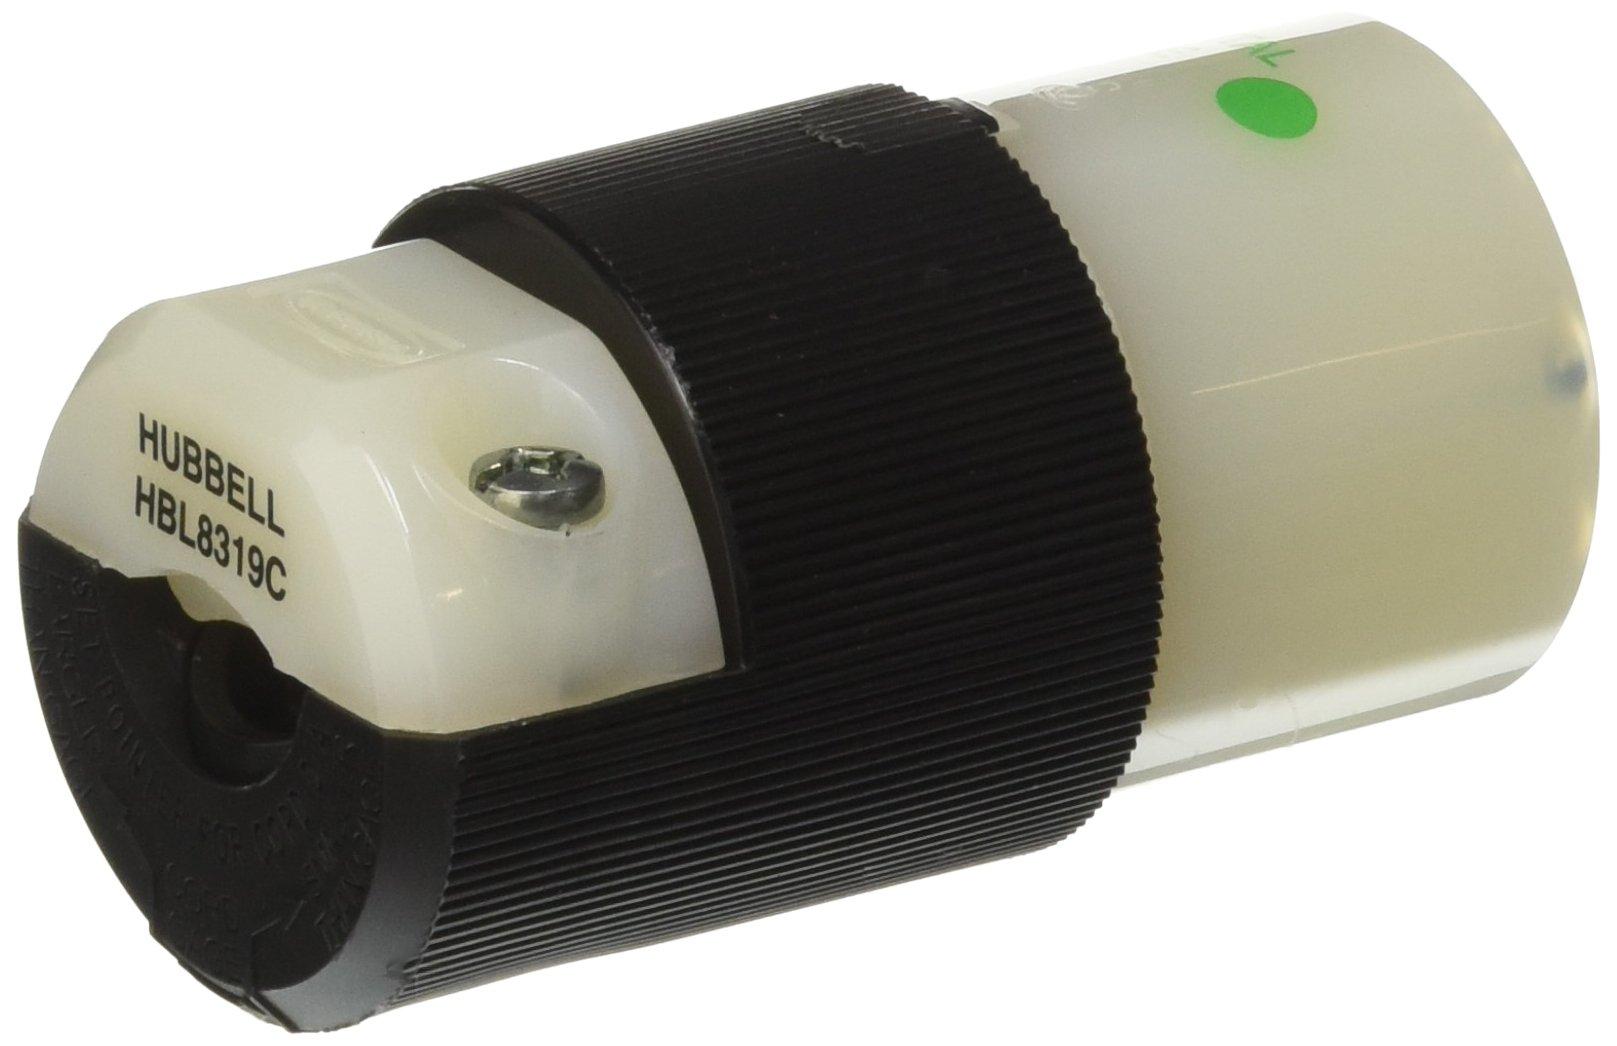 Hubbell HBL8319C Connector, Hospital Grade, 20 amp, 125V, 5-20R, Black/White